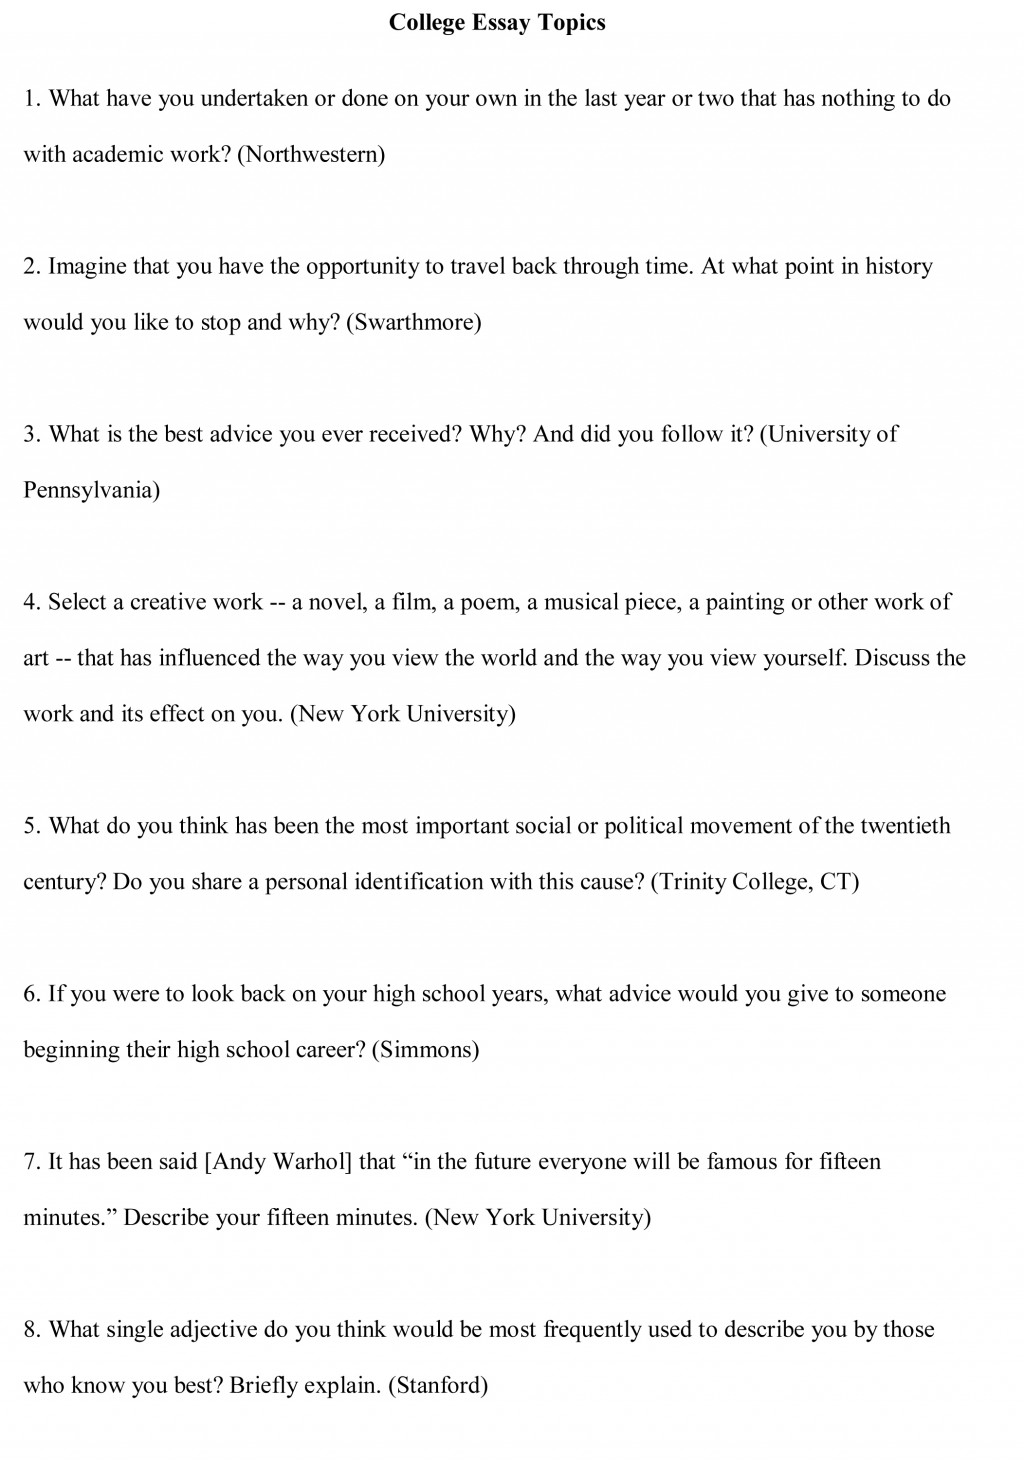 001 College Essay Topics Free Sample1 Example Marvelous Creative 2017 Unique 2018 Large